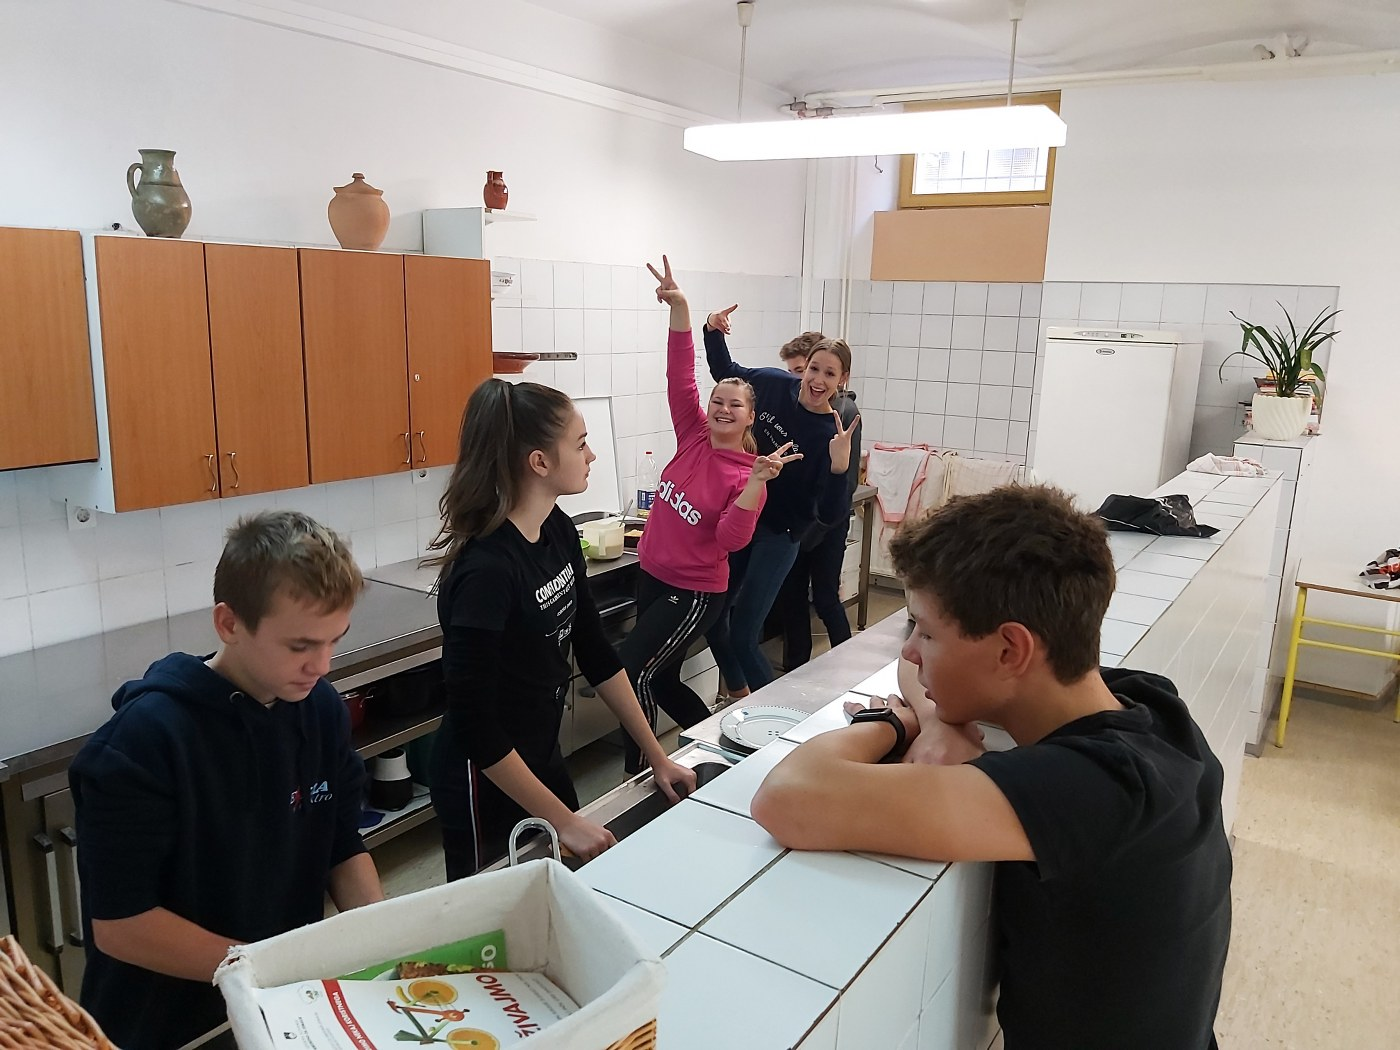 2019_10_07_teden_otroka_palacinke-1